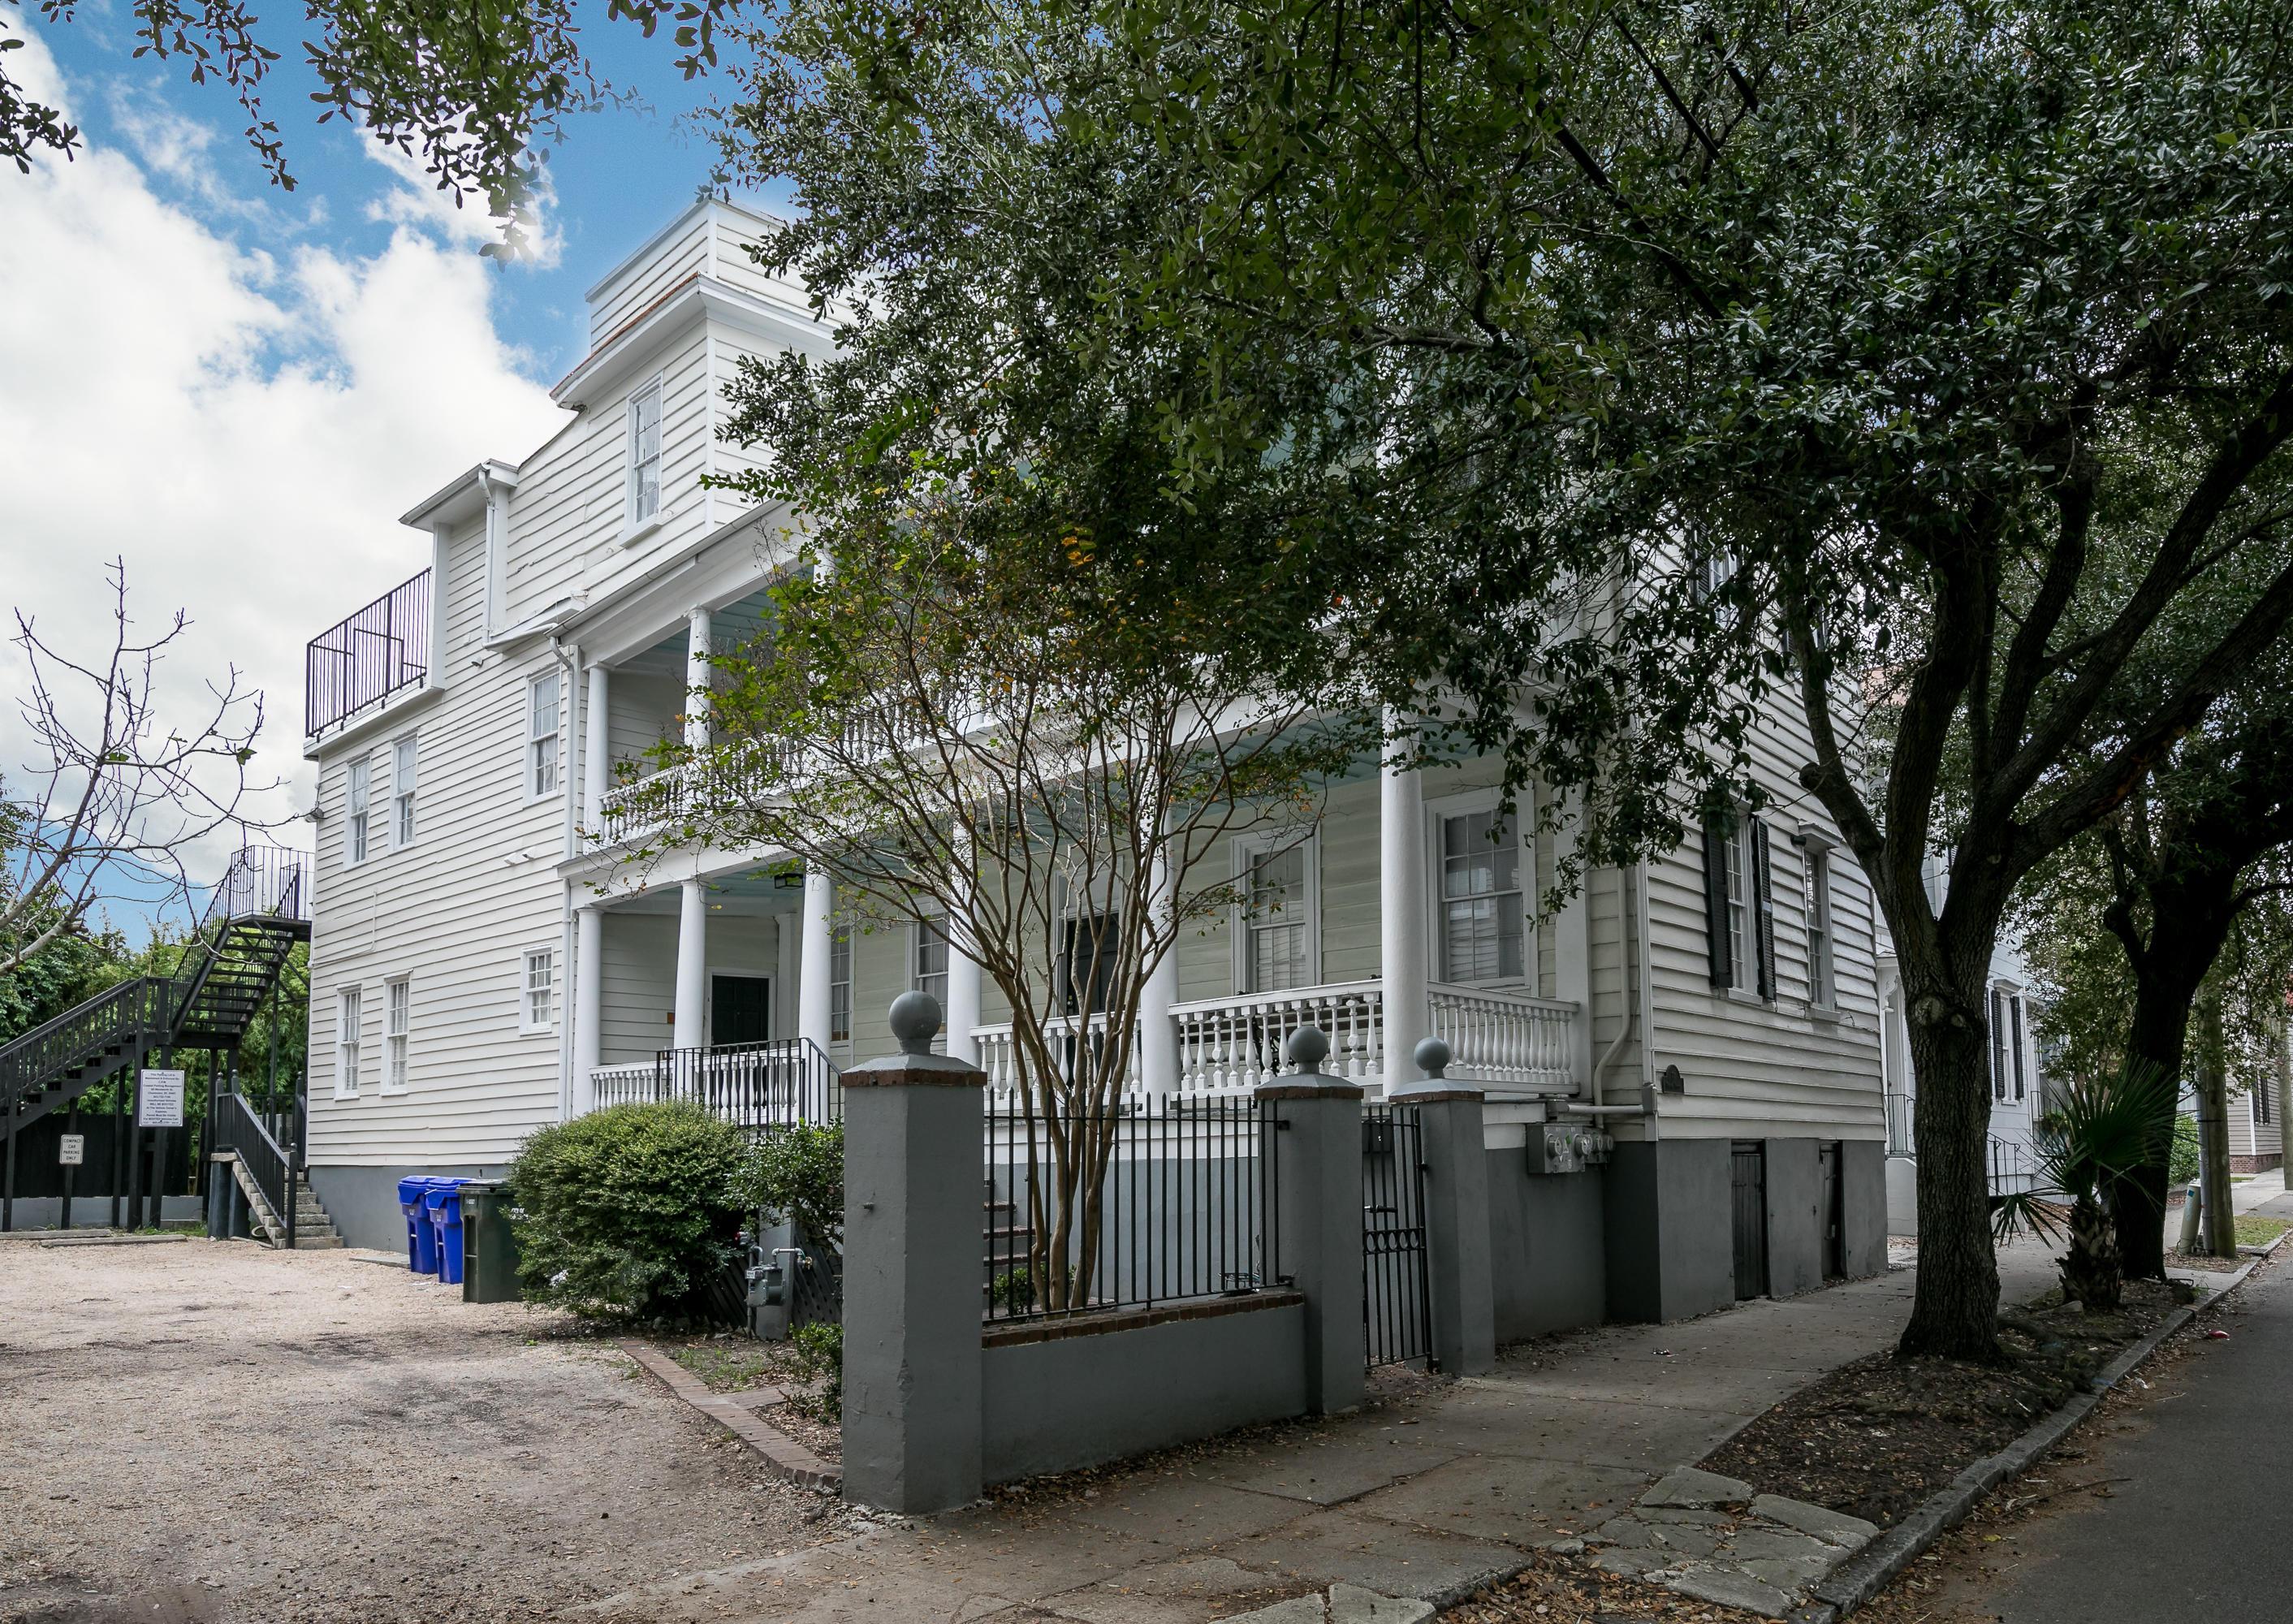 31 Coming Street, Charleston SC 29401 - Photo 2